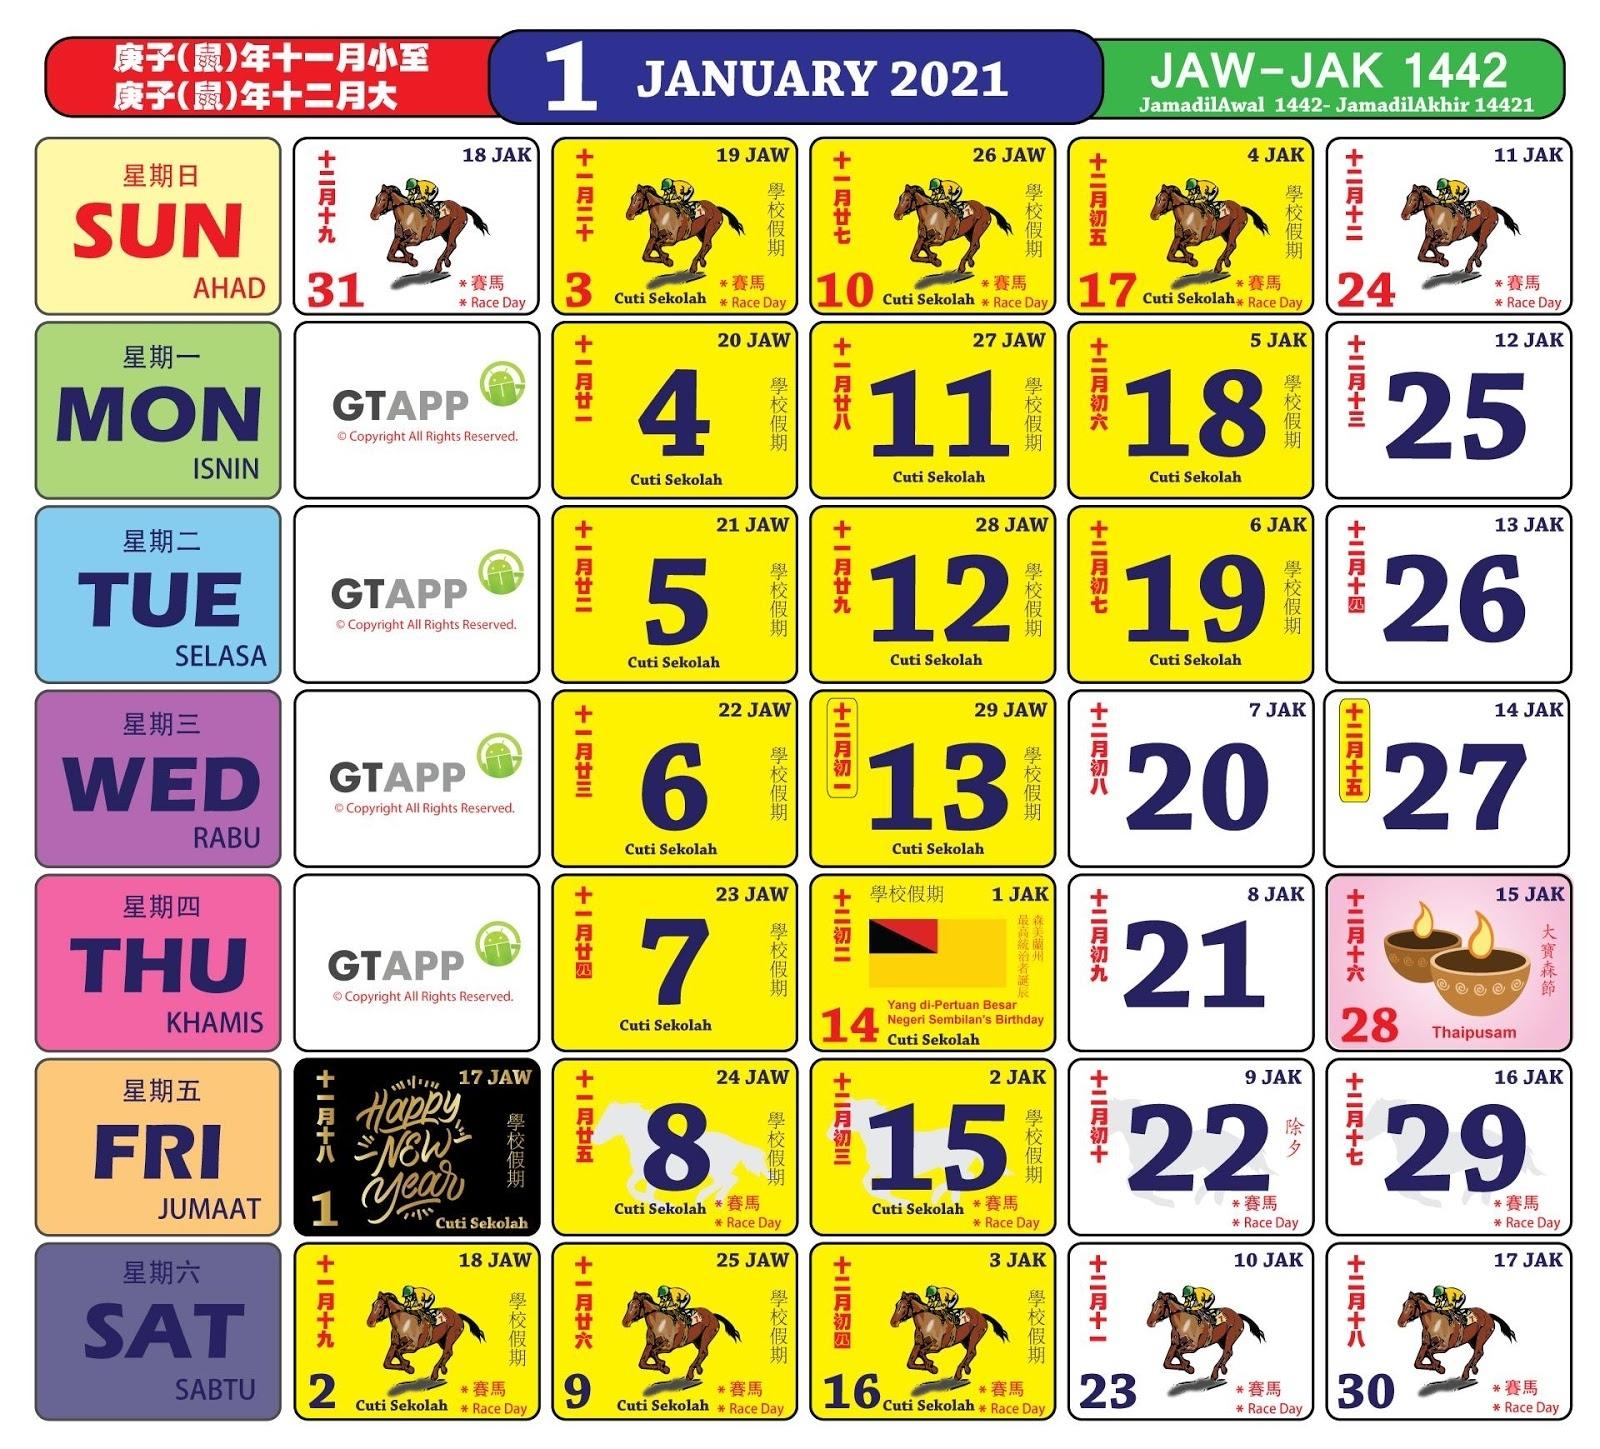 Goh'S Digital Library: 2021 Kuda Lunar Calendar